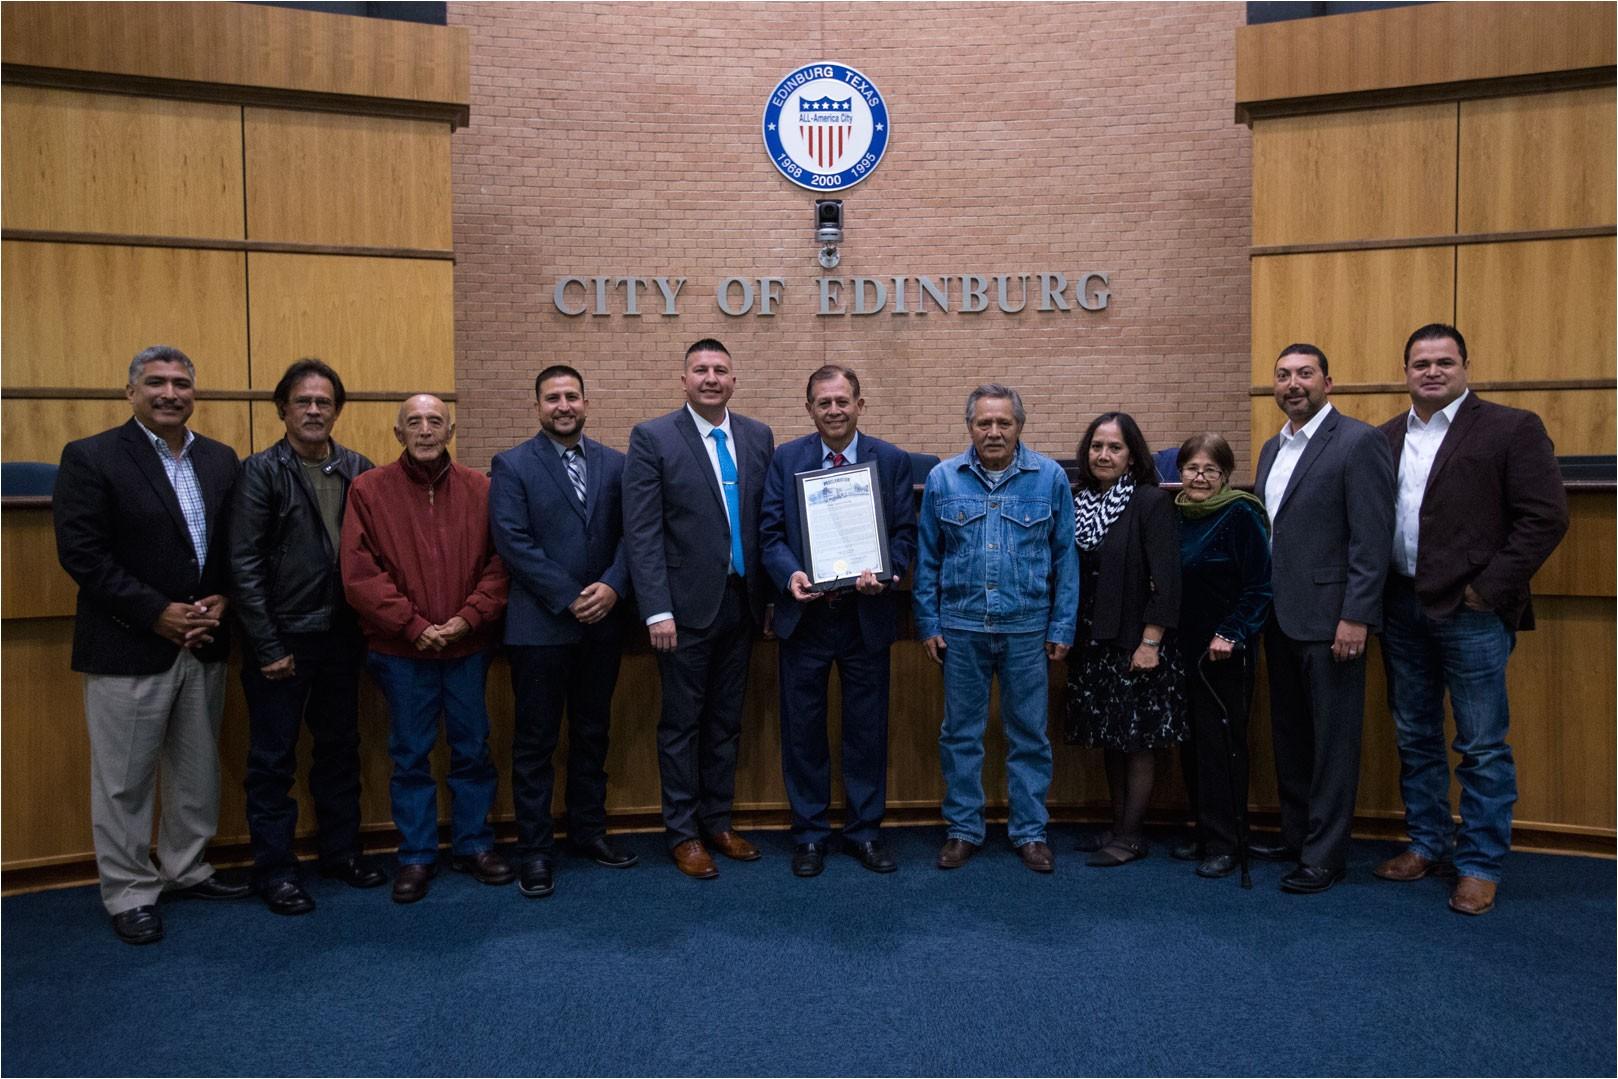 edinburg texas nov 21 2018 the edinburg city council recognized judge juan r partida for 30 years of service to the 275th district court